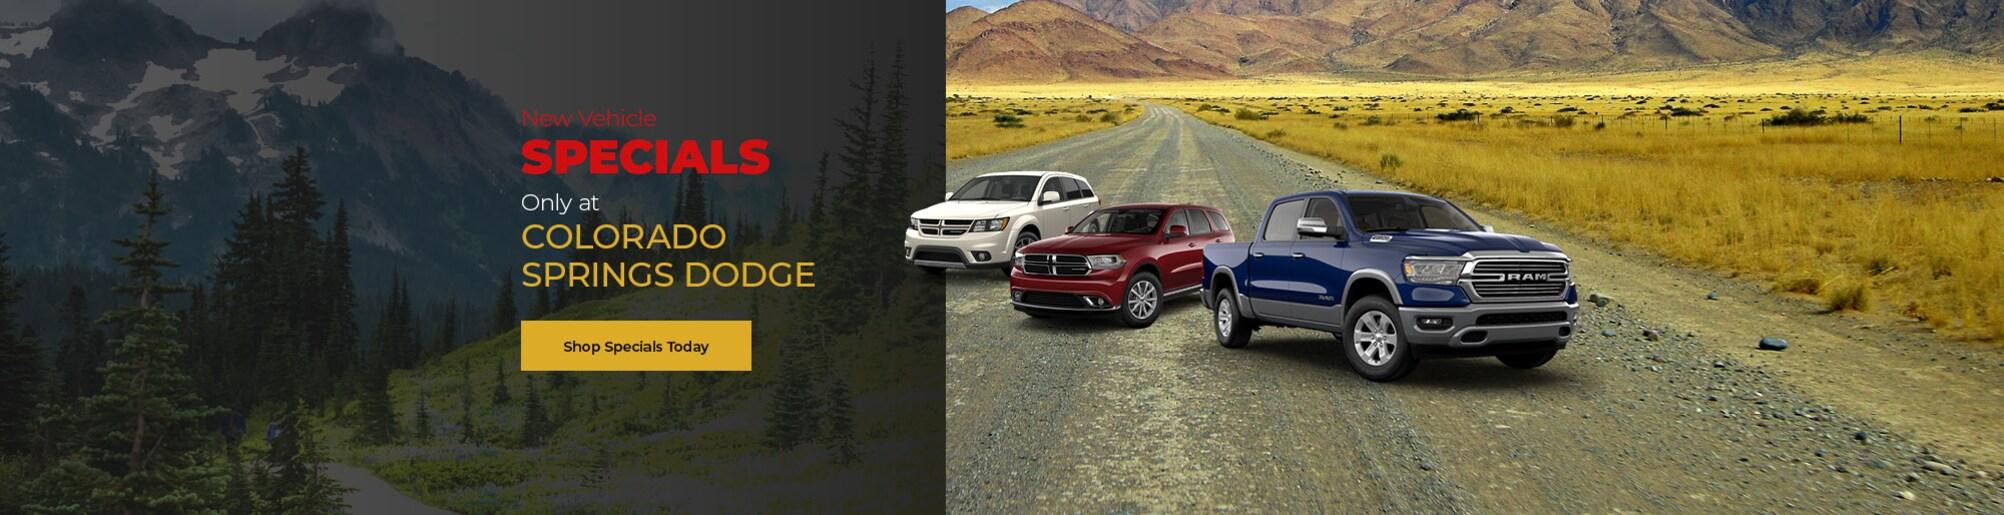 Colorado Springs Dodge >> Colorado Springs Dodge Dodge Ram Dealership In Colorado Springs